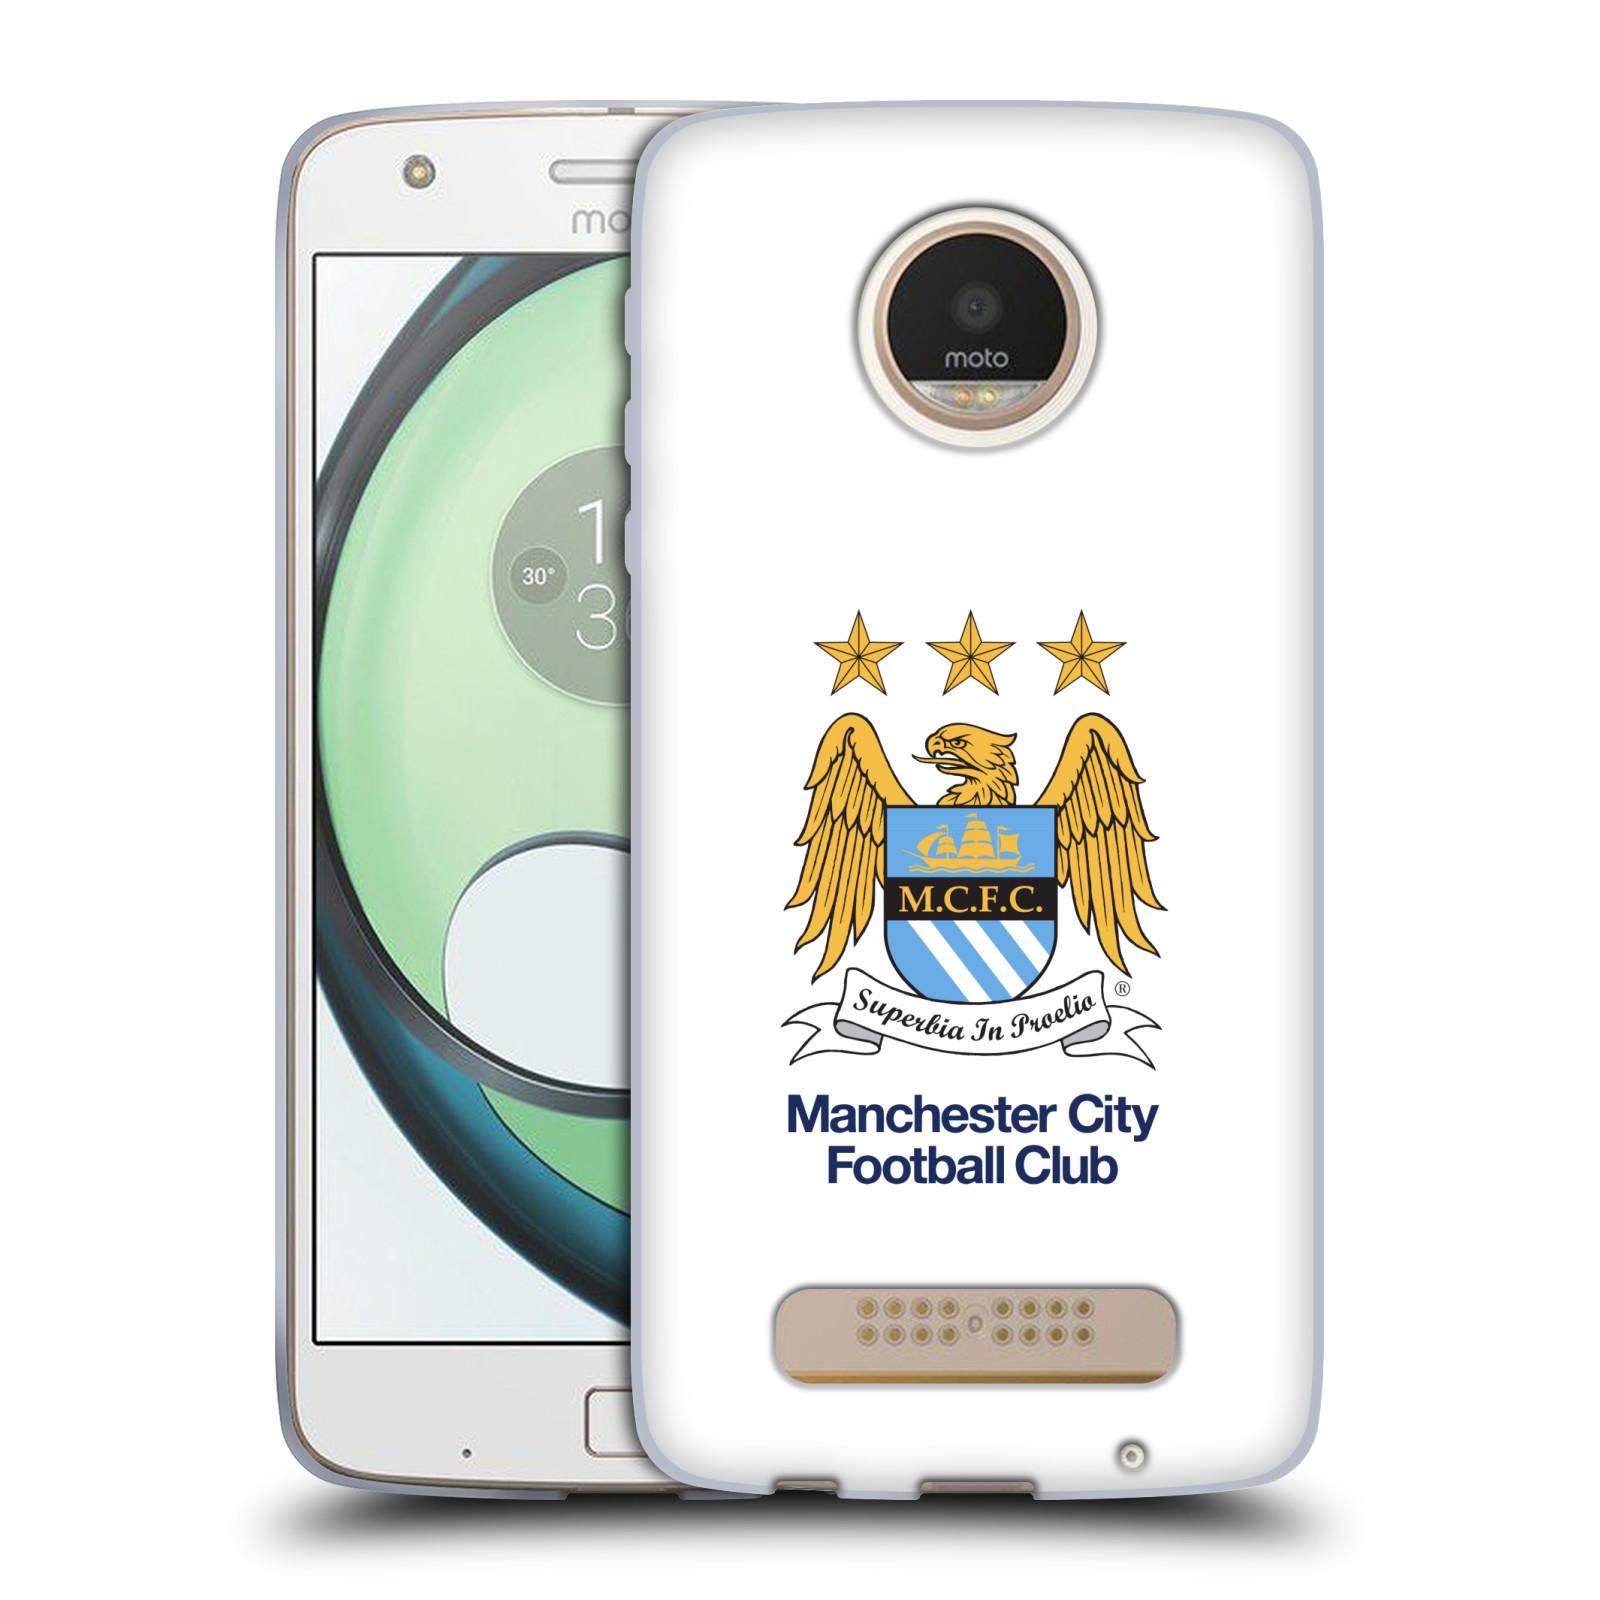 HEAD CASE silikonový obal na mobil Lenovo Moto Z PLAY Fotbalový klub Manchester City bílé pozadí velký znak pták